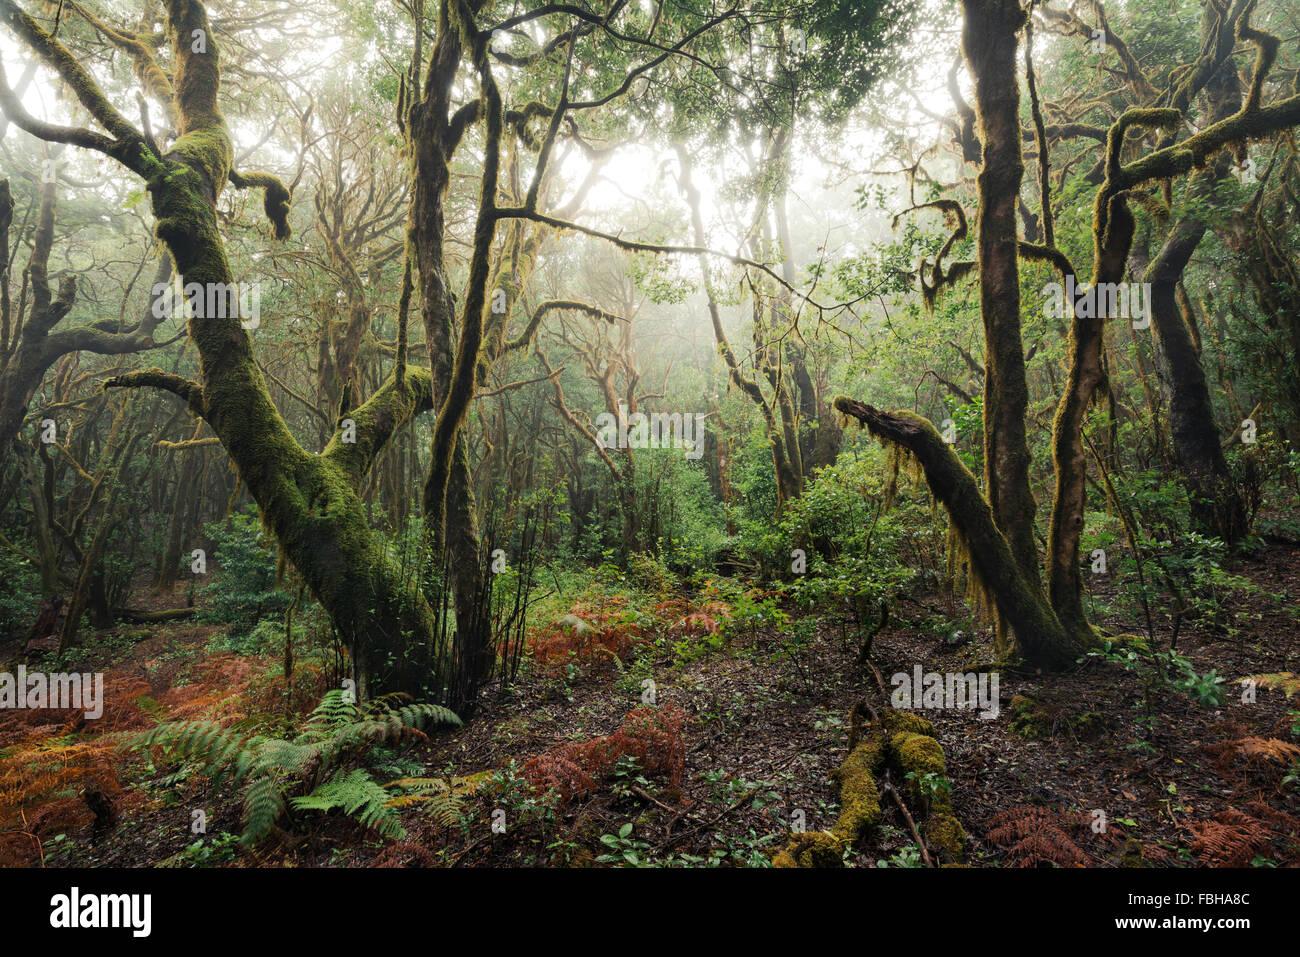 Spanien, La Gomera, Lorbeer, Wald, Moos, Skurril, Bäume, Äste, Farn, Farben, Stimmung, Nebel, mystisch, Stockbild